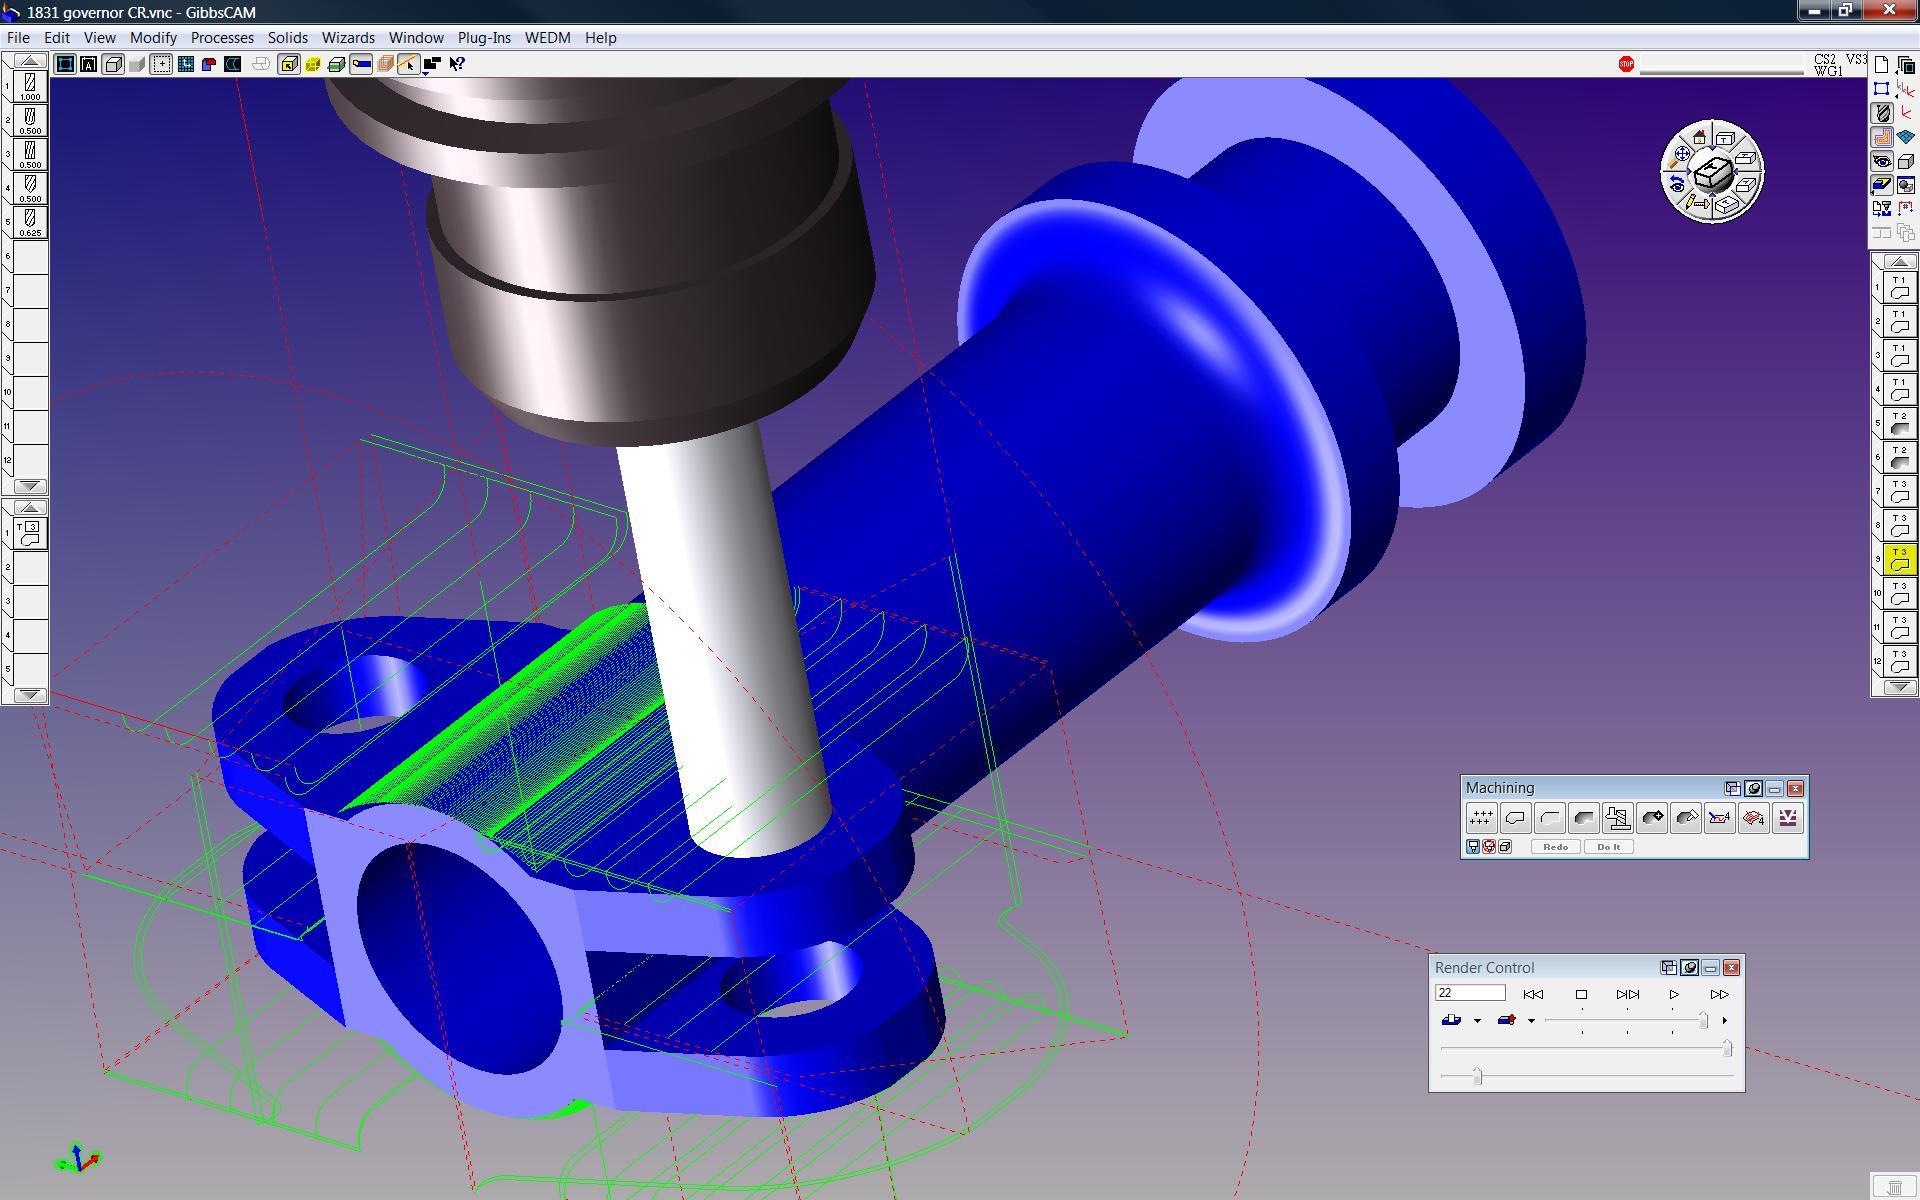 Gibbscam Tool Simulation